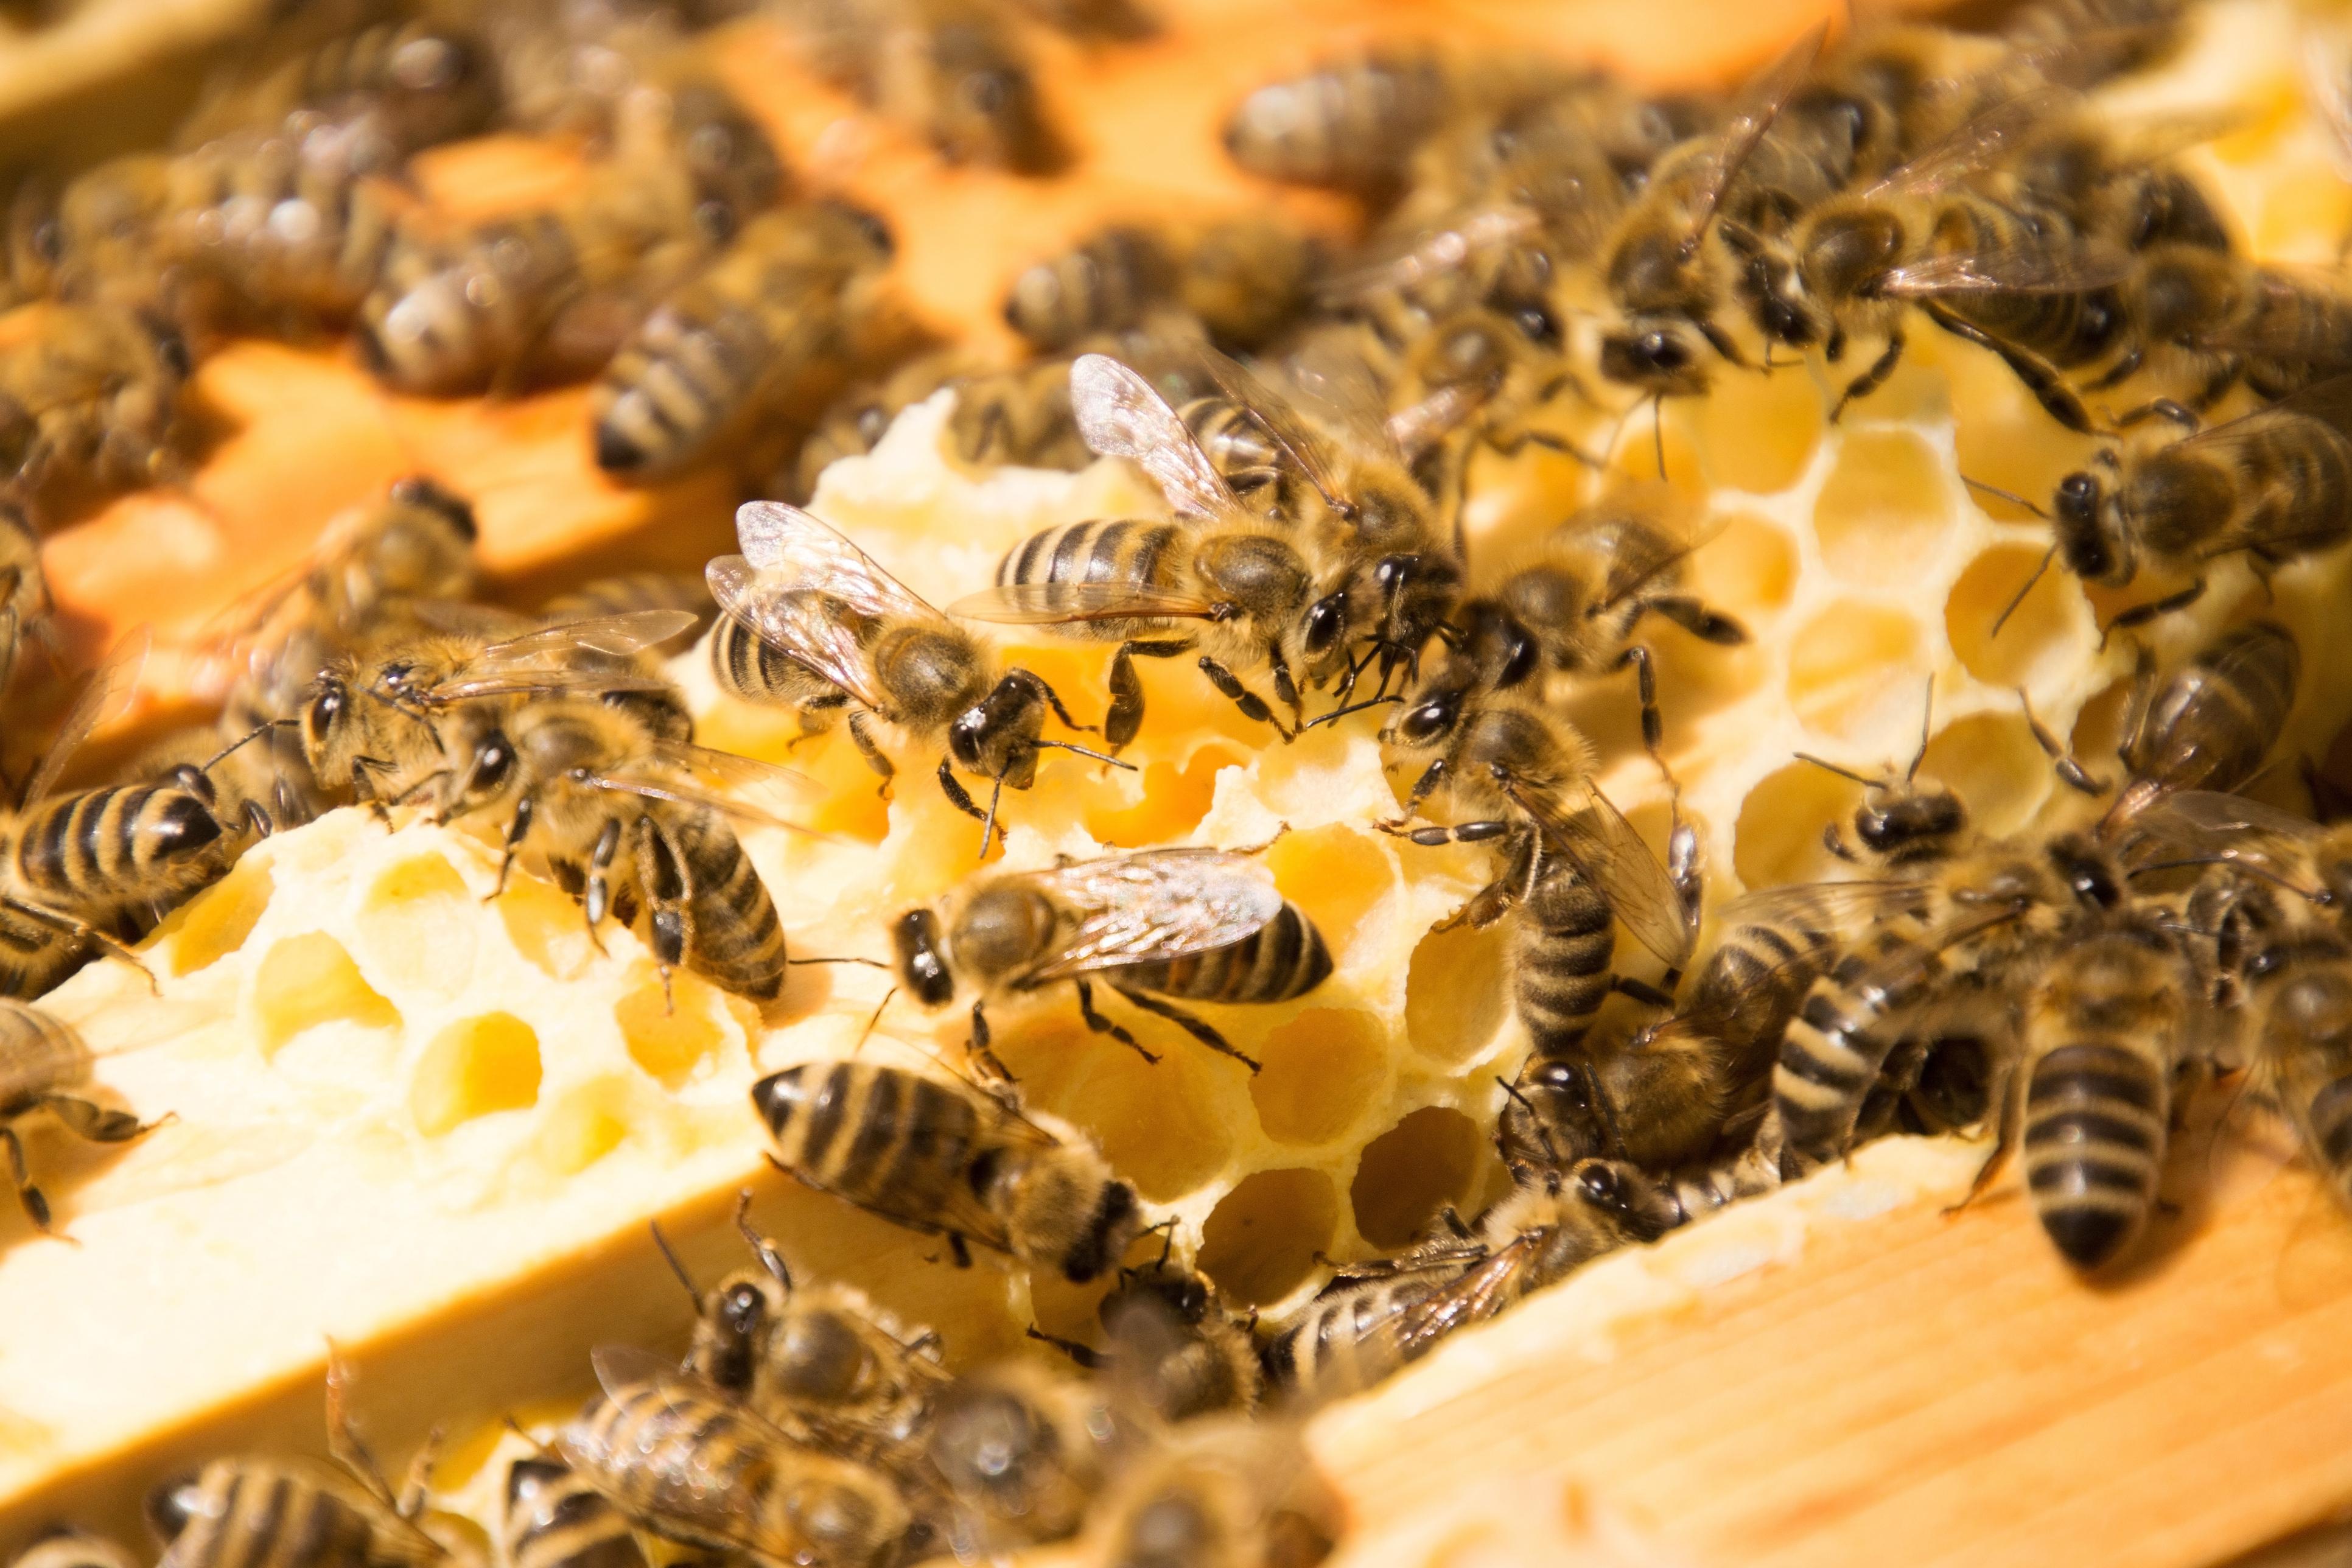 Honey Bee Image 02